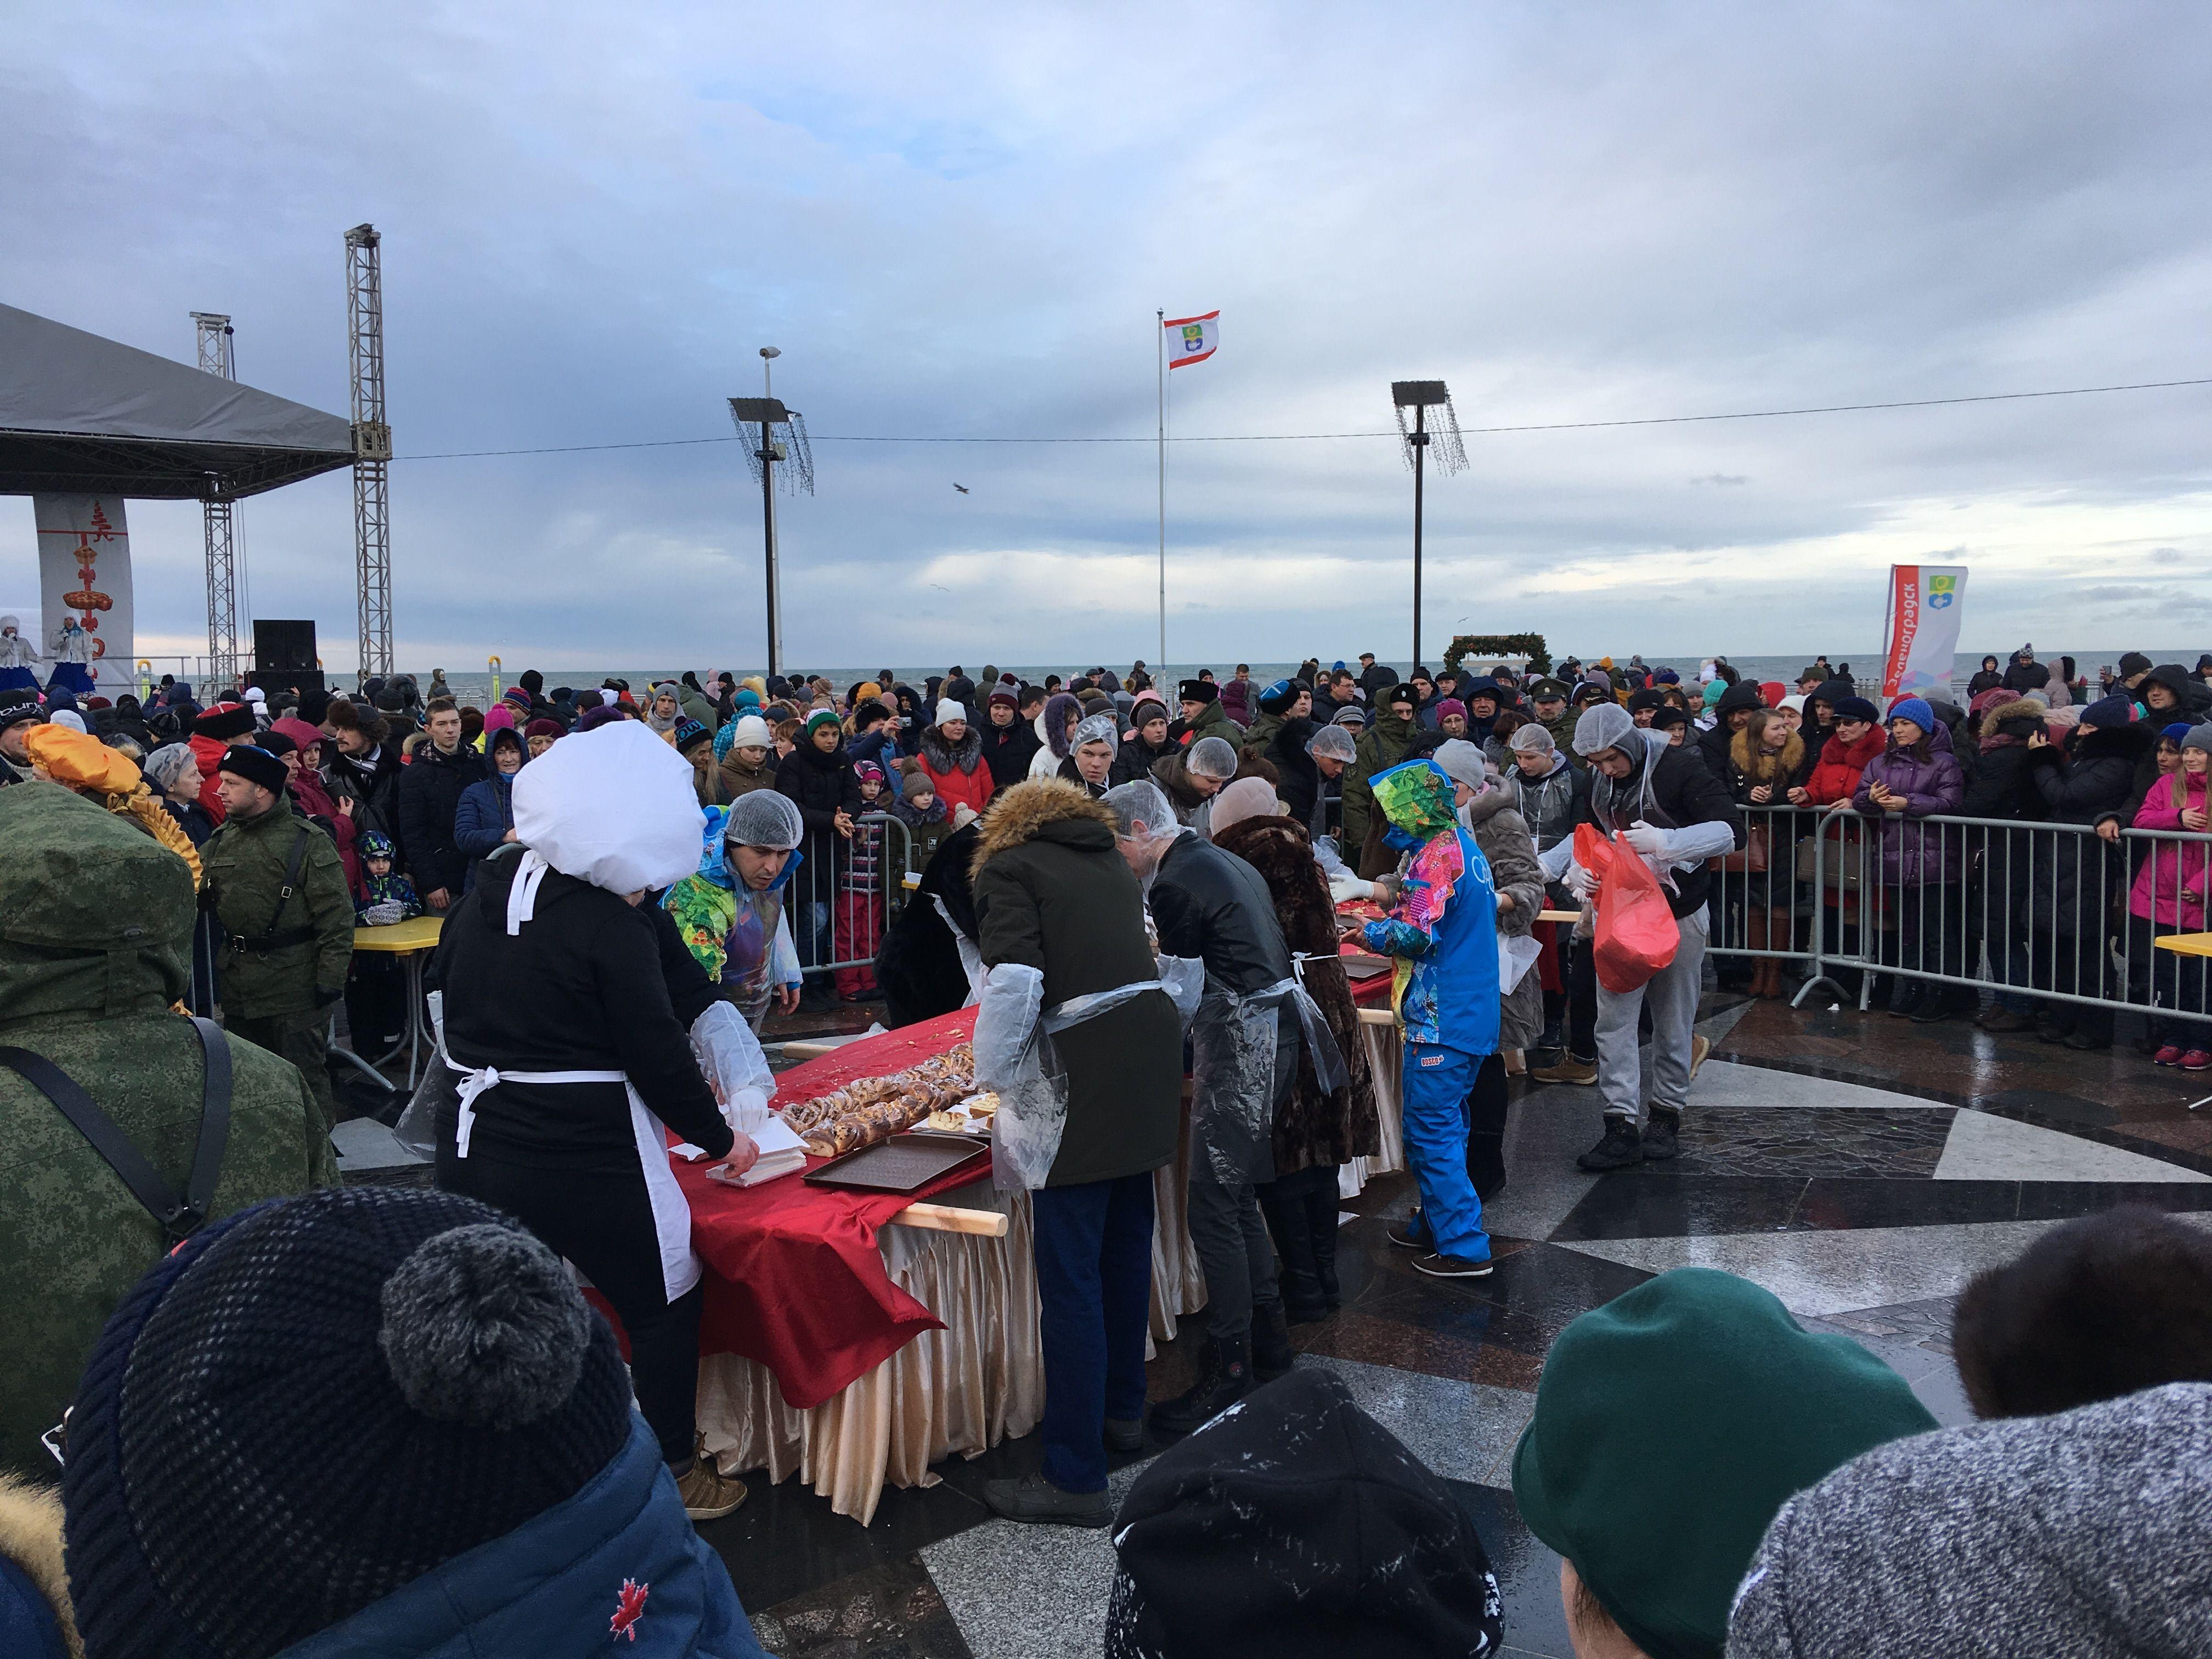 Море народу на площади ветров